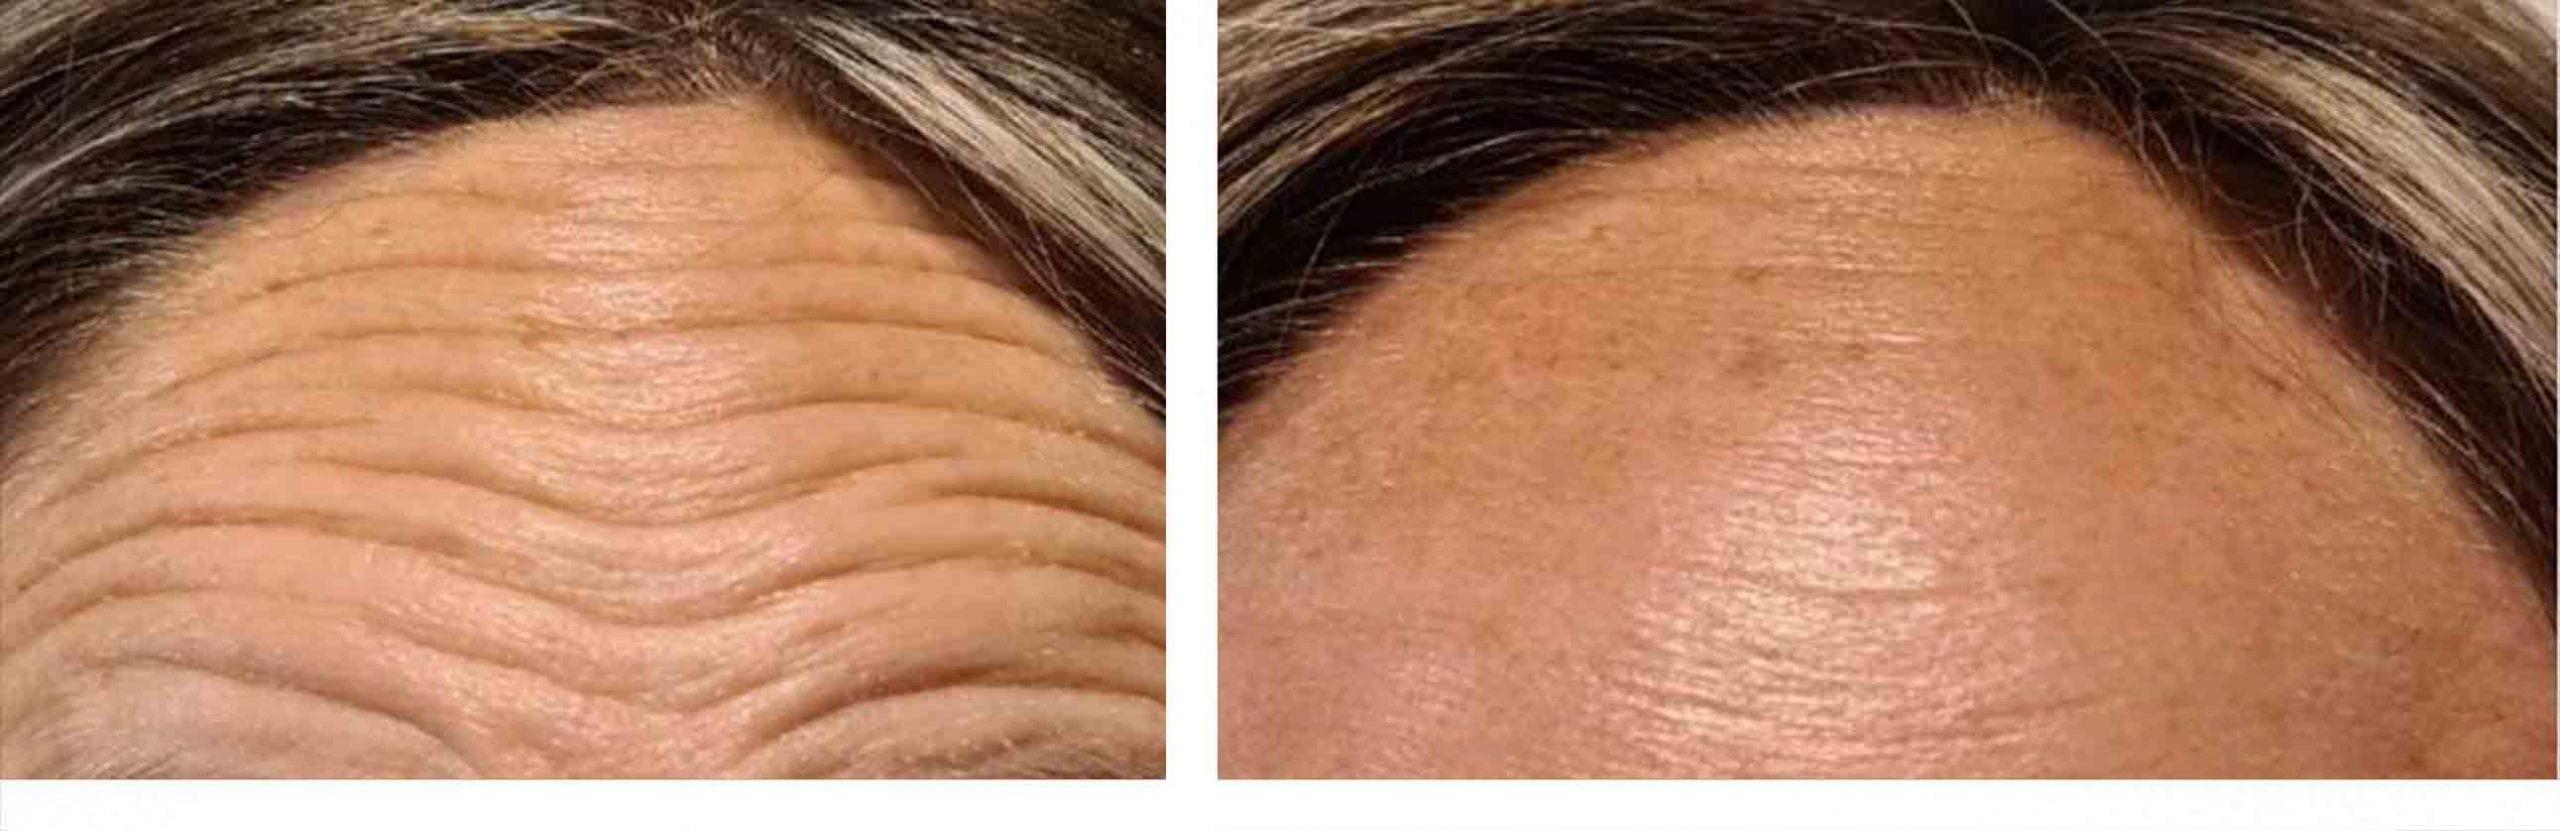 eliminar arrugas frente botox